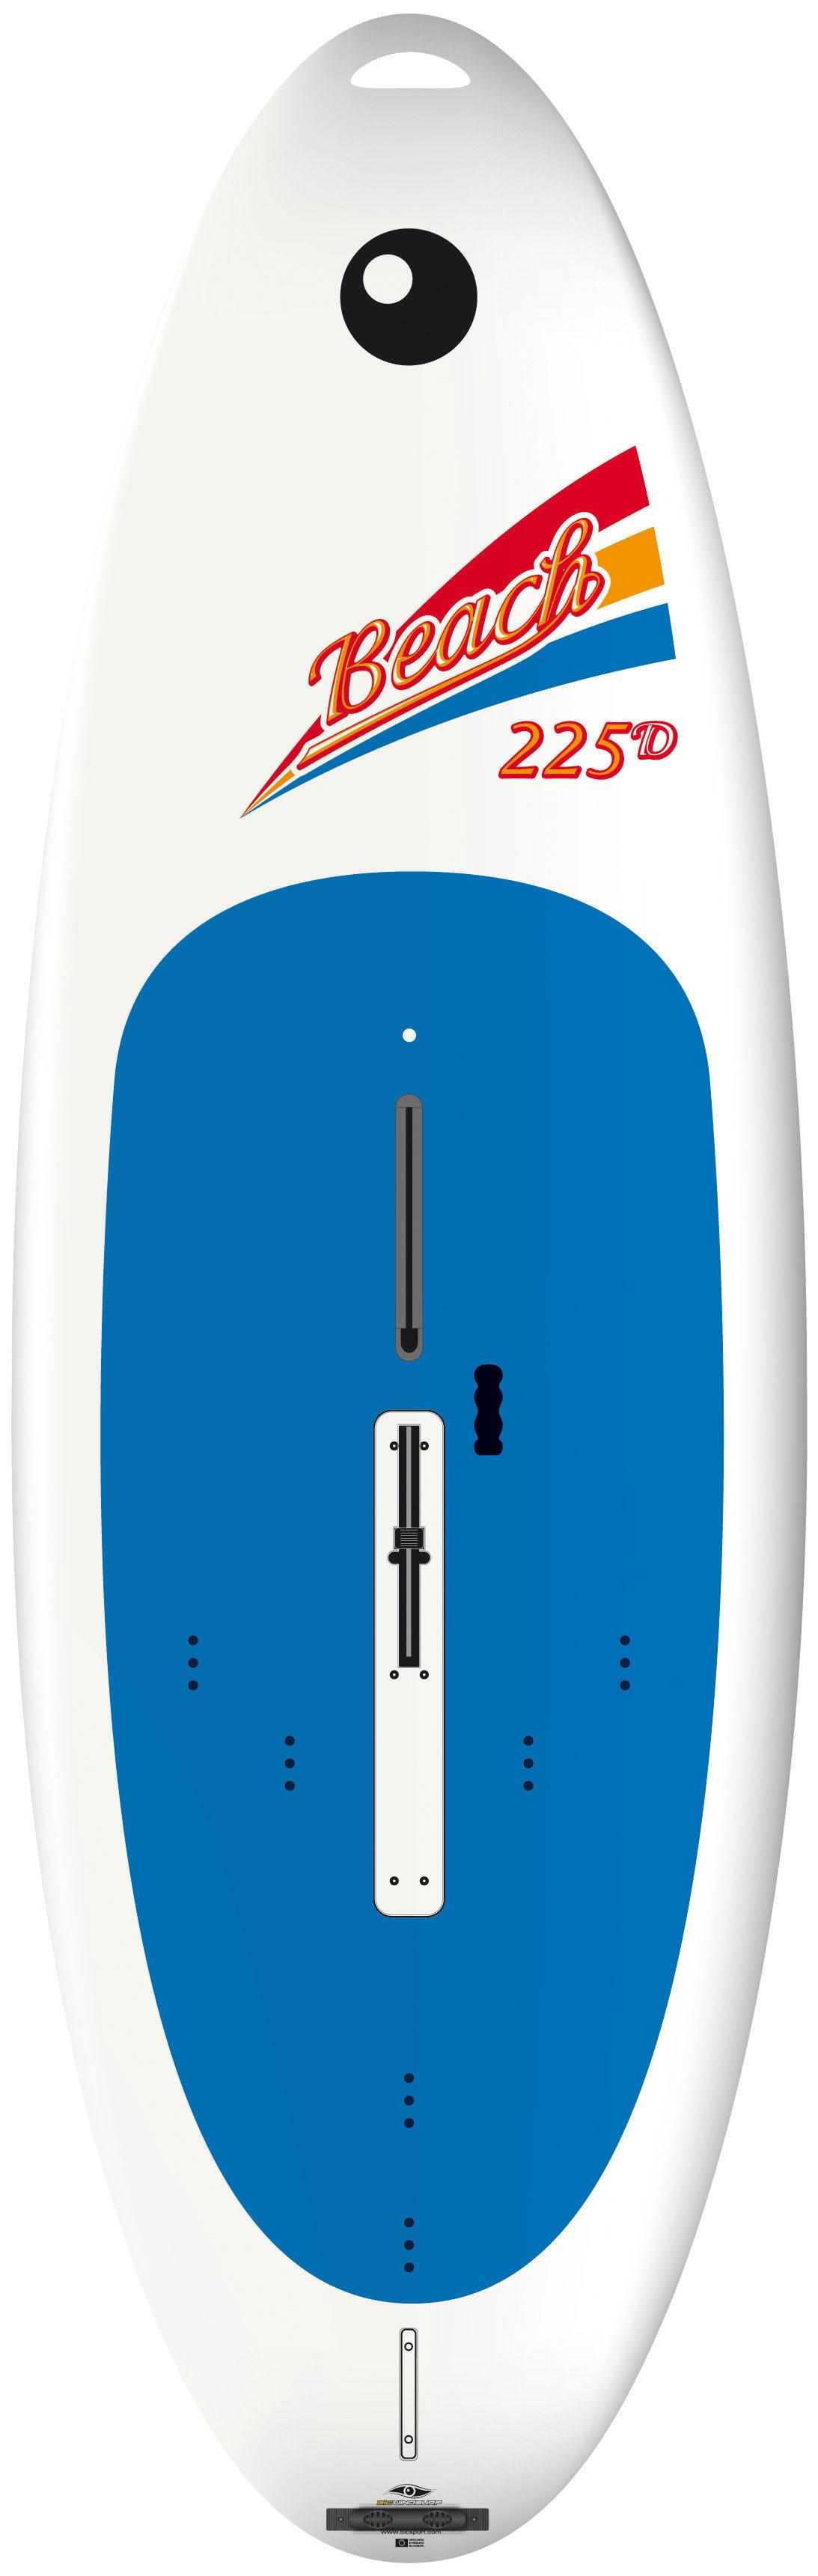 Bic Beach 225D Windsurf Board 90cm